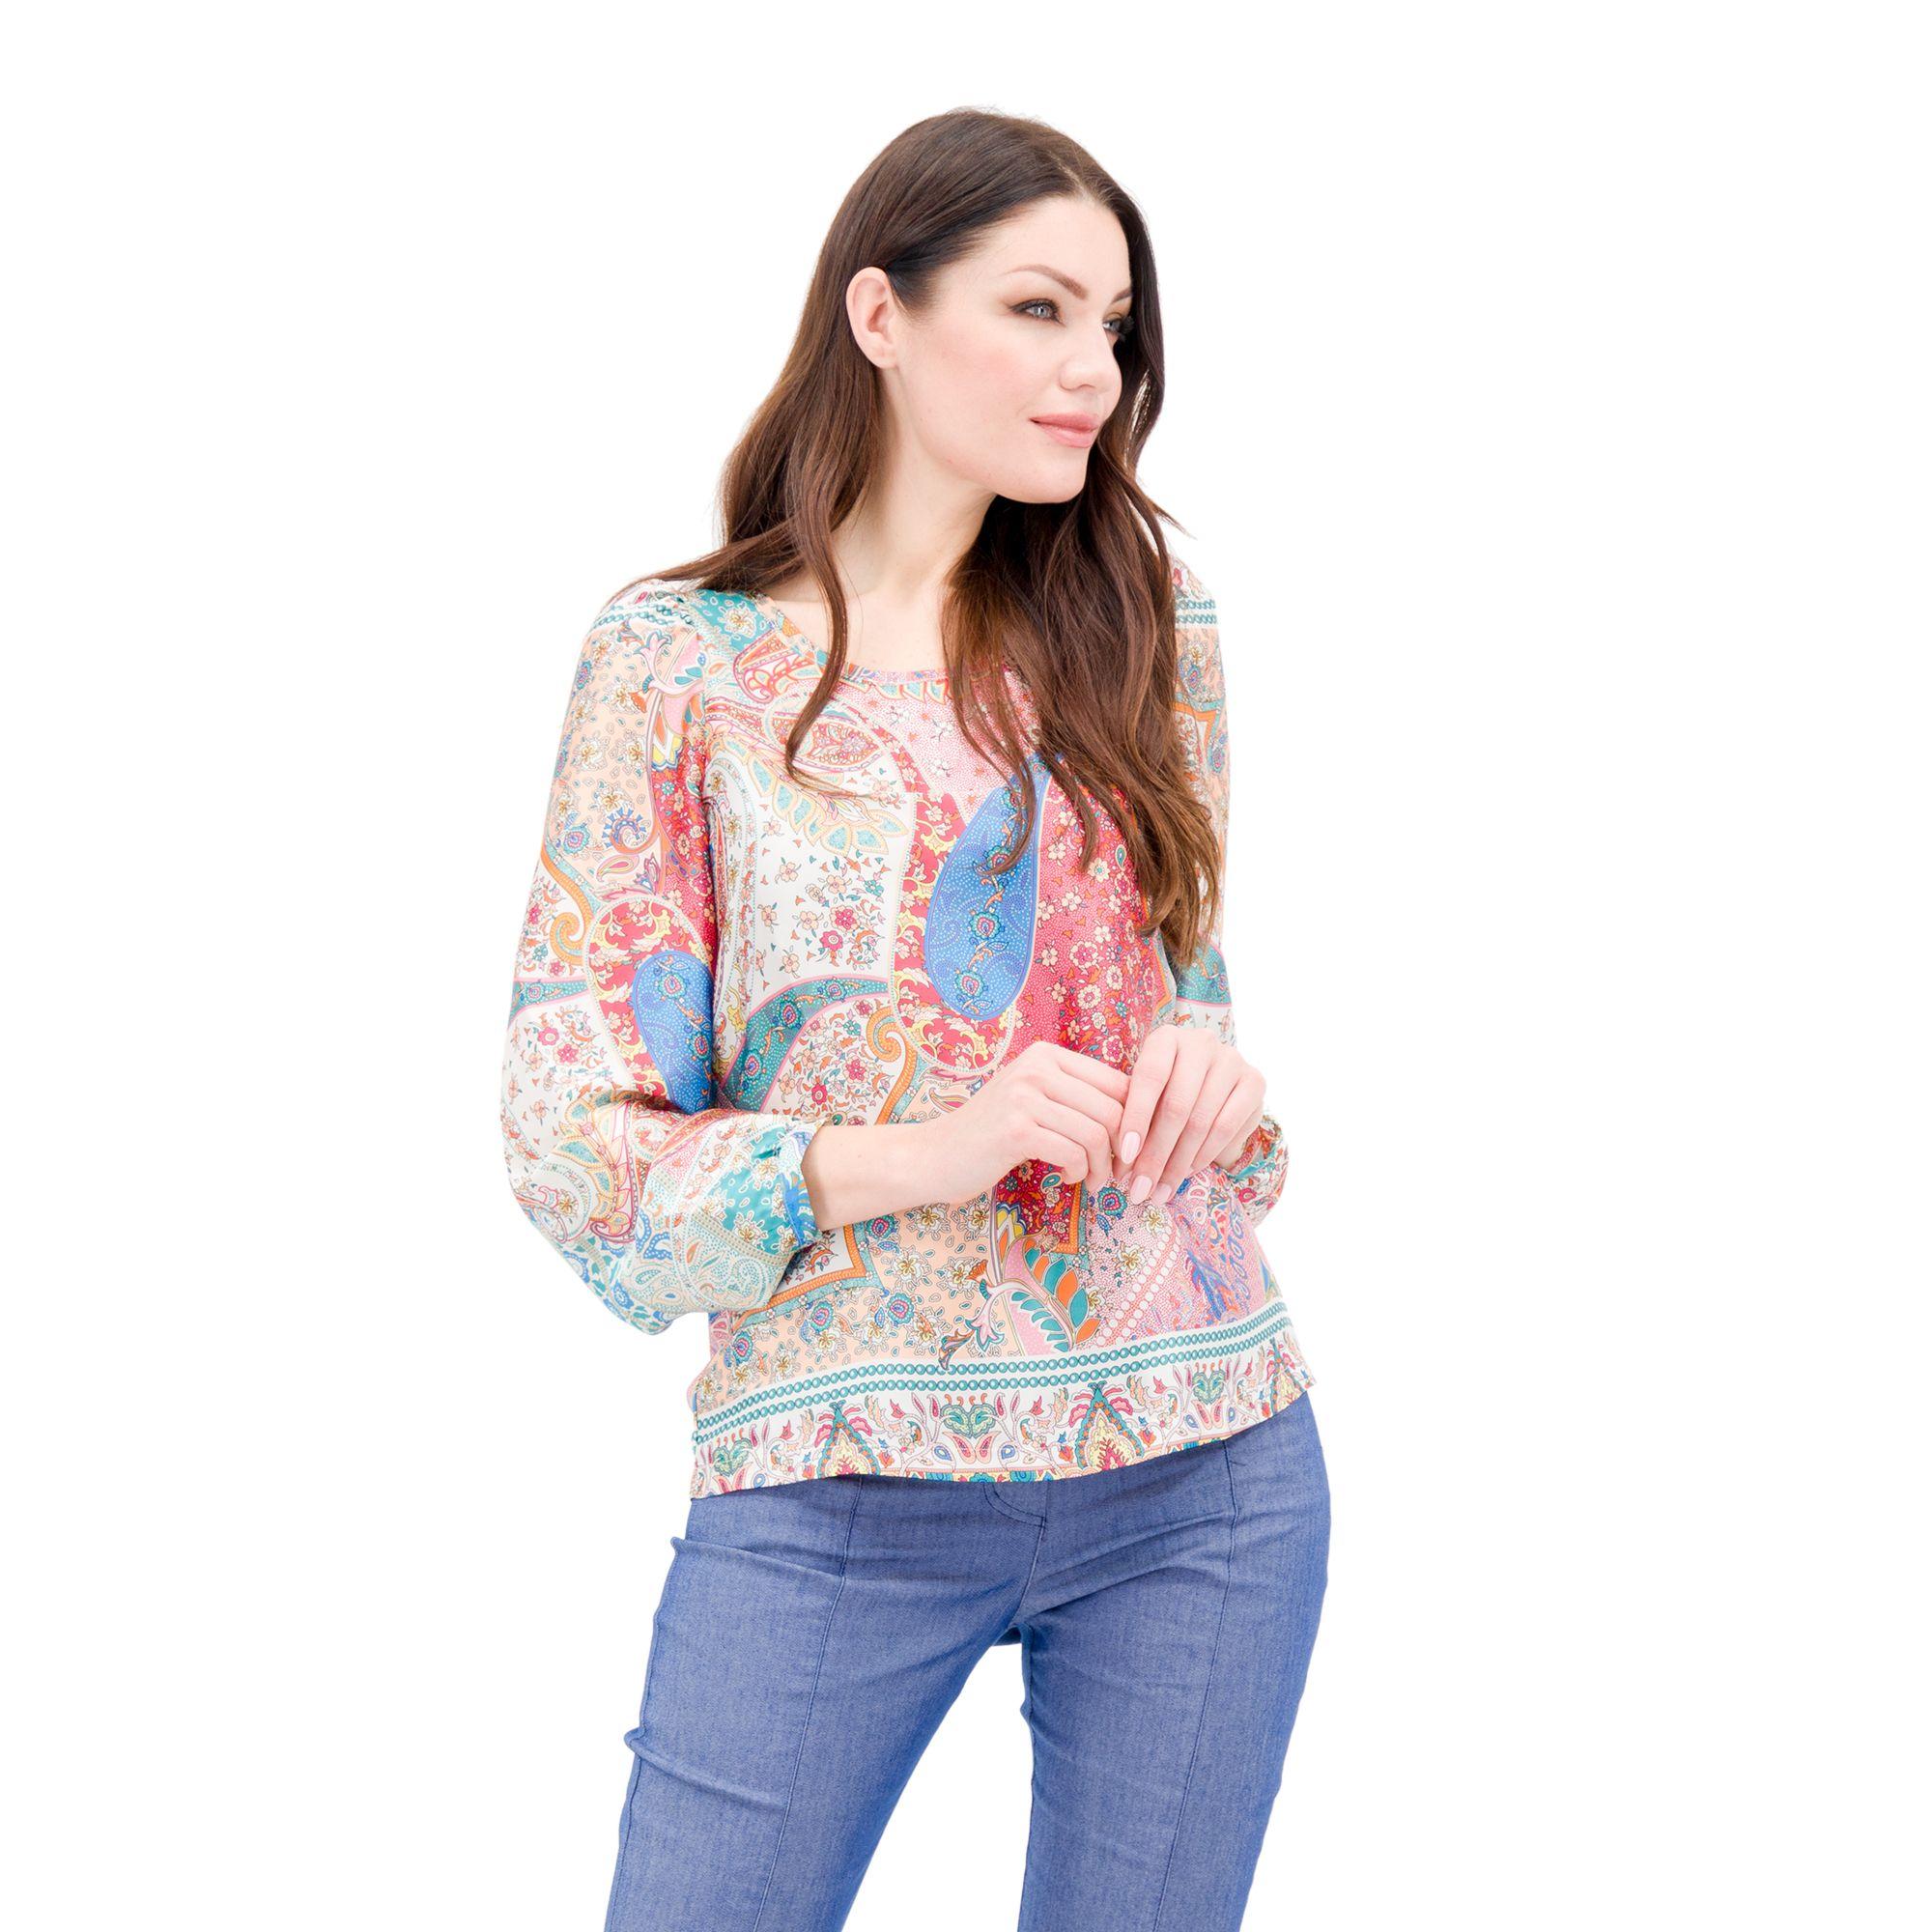 Image of Blusa in raso con fantasia patchwork